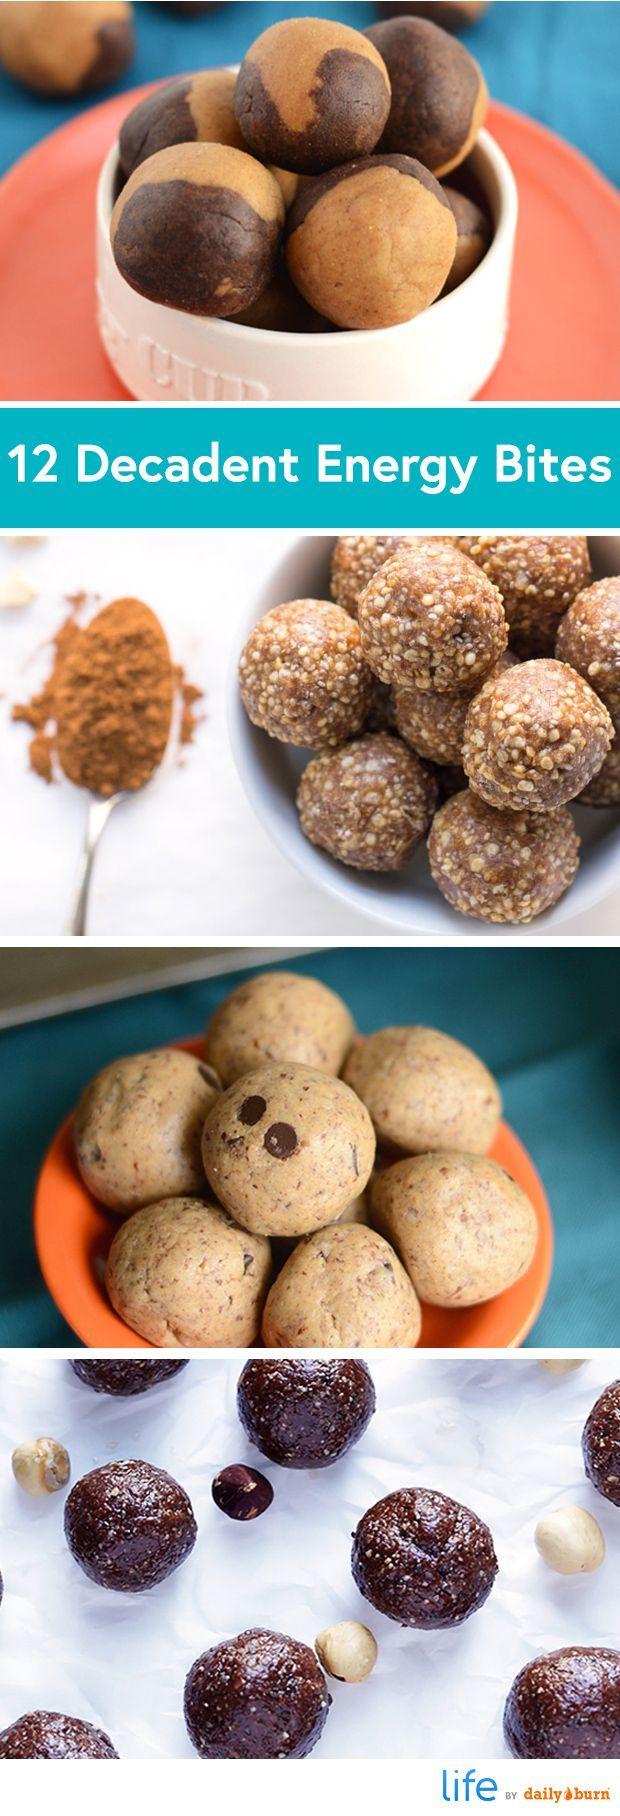 12 Healthy Energy Bites Recipes That Taste Like Dessert (via Daily Burn)